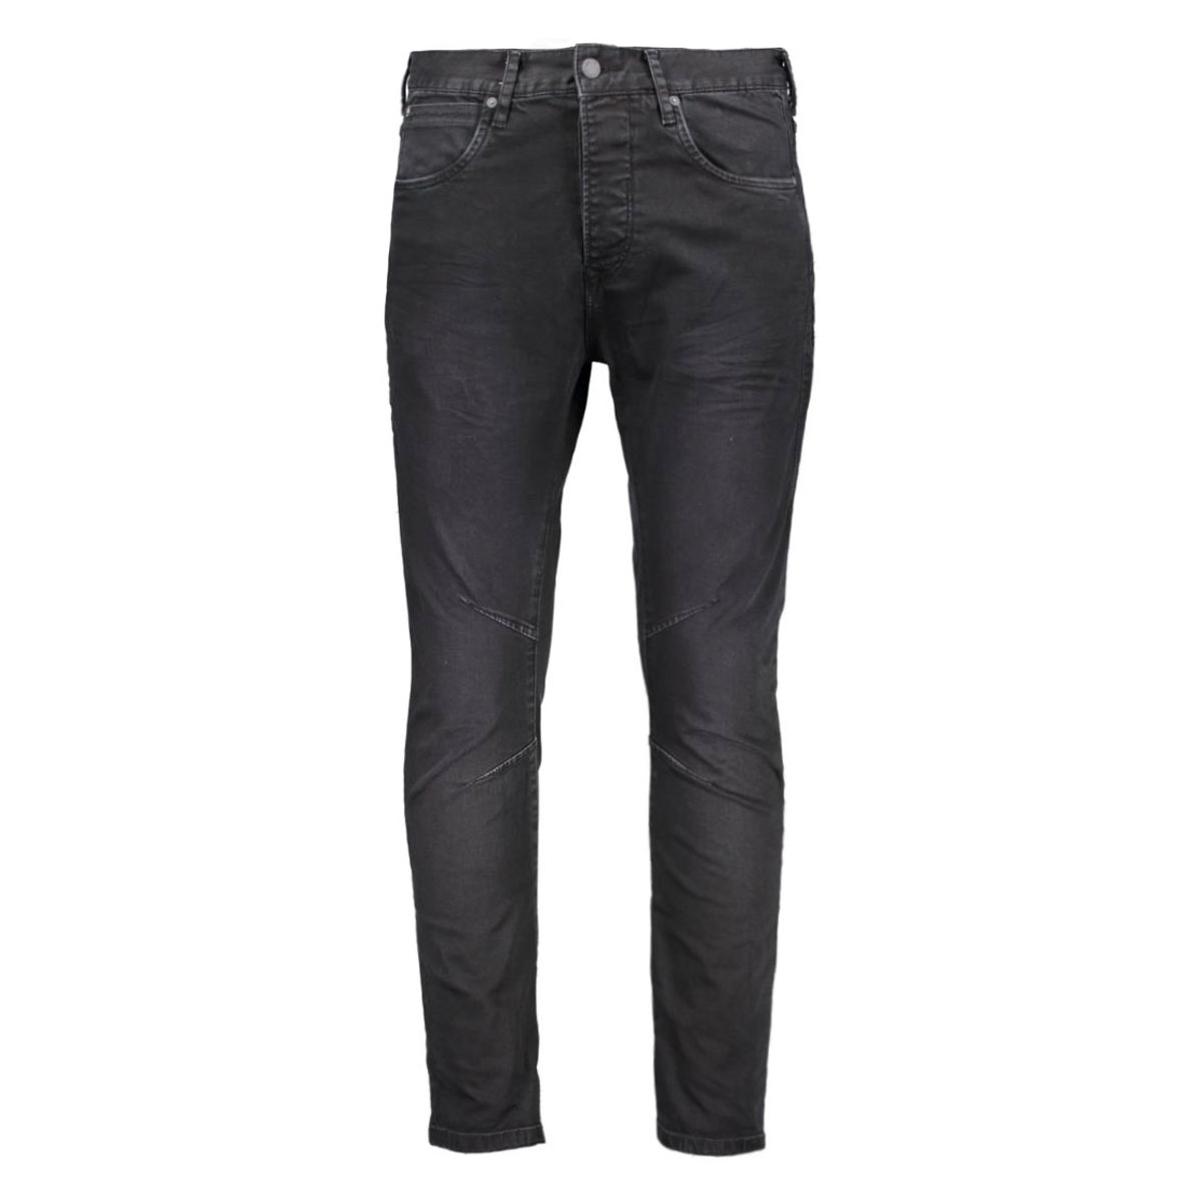 jjiluke jjecho jos 999 black noos 12117933 jack & jones jeans black